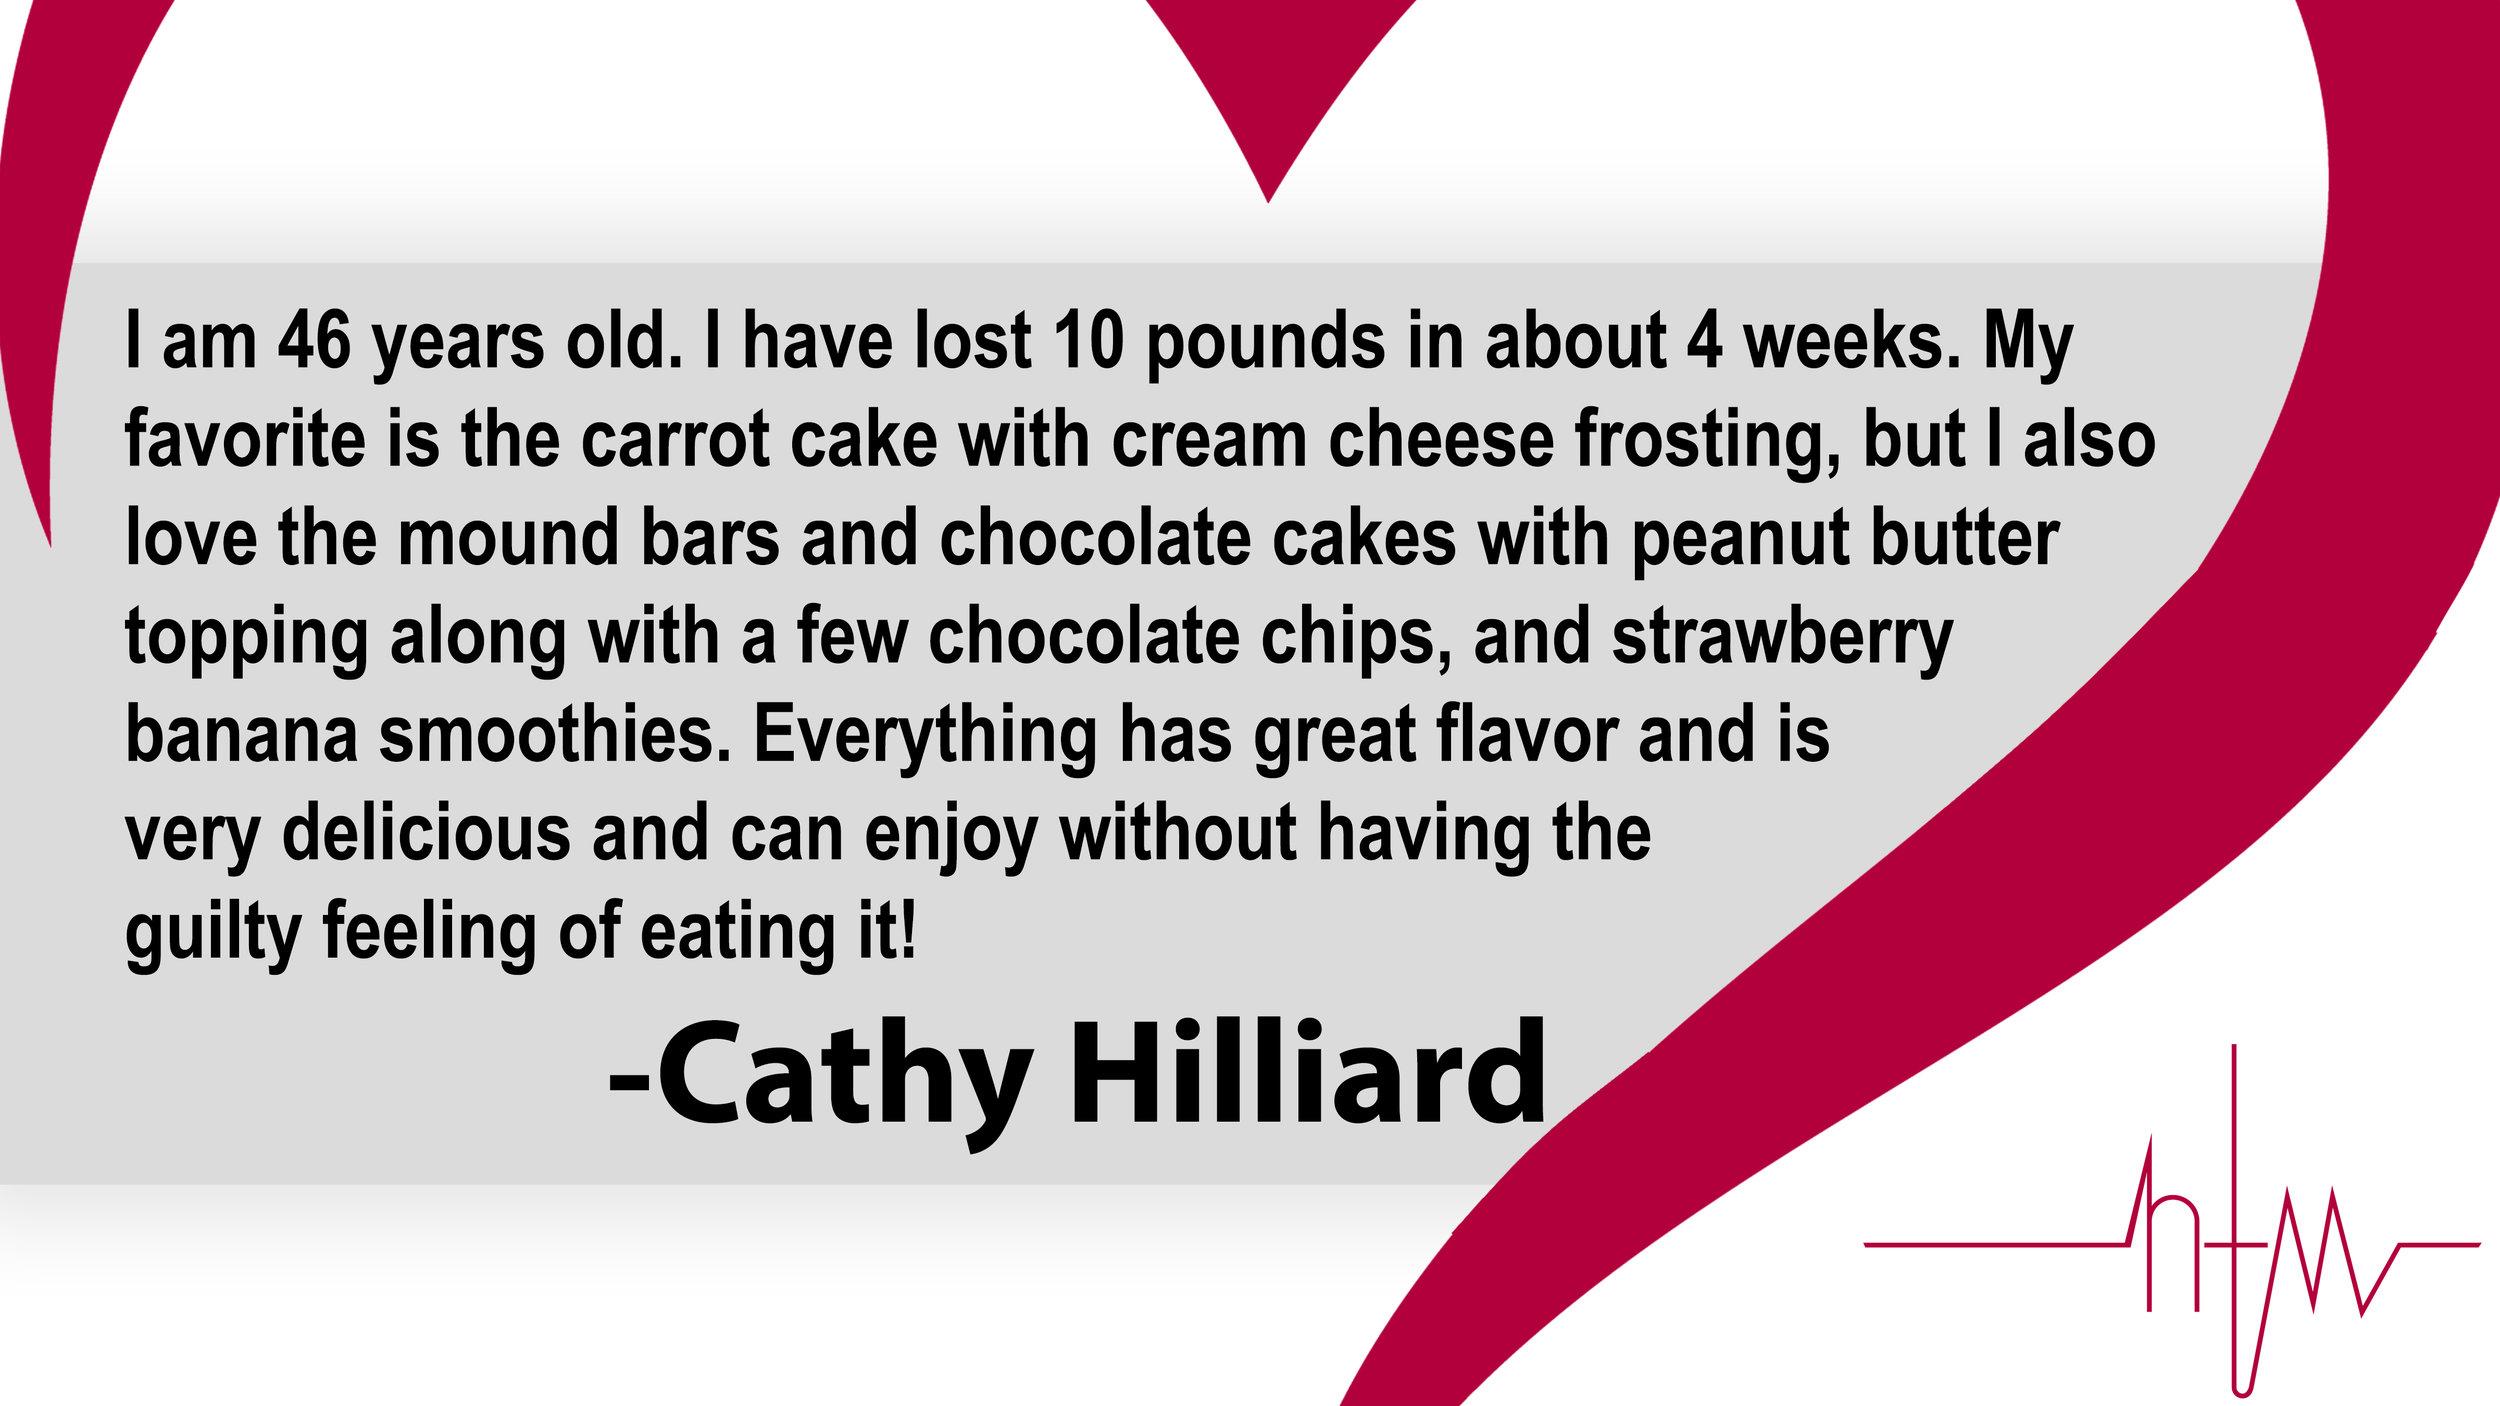 Cathy_Hilliard_Testimony.jpg